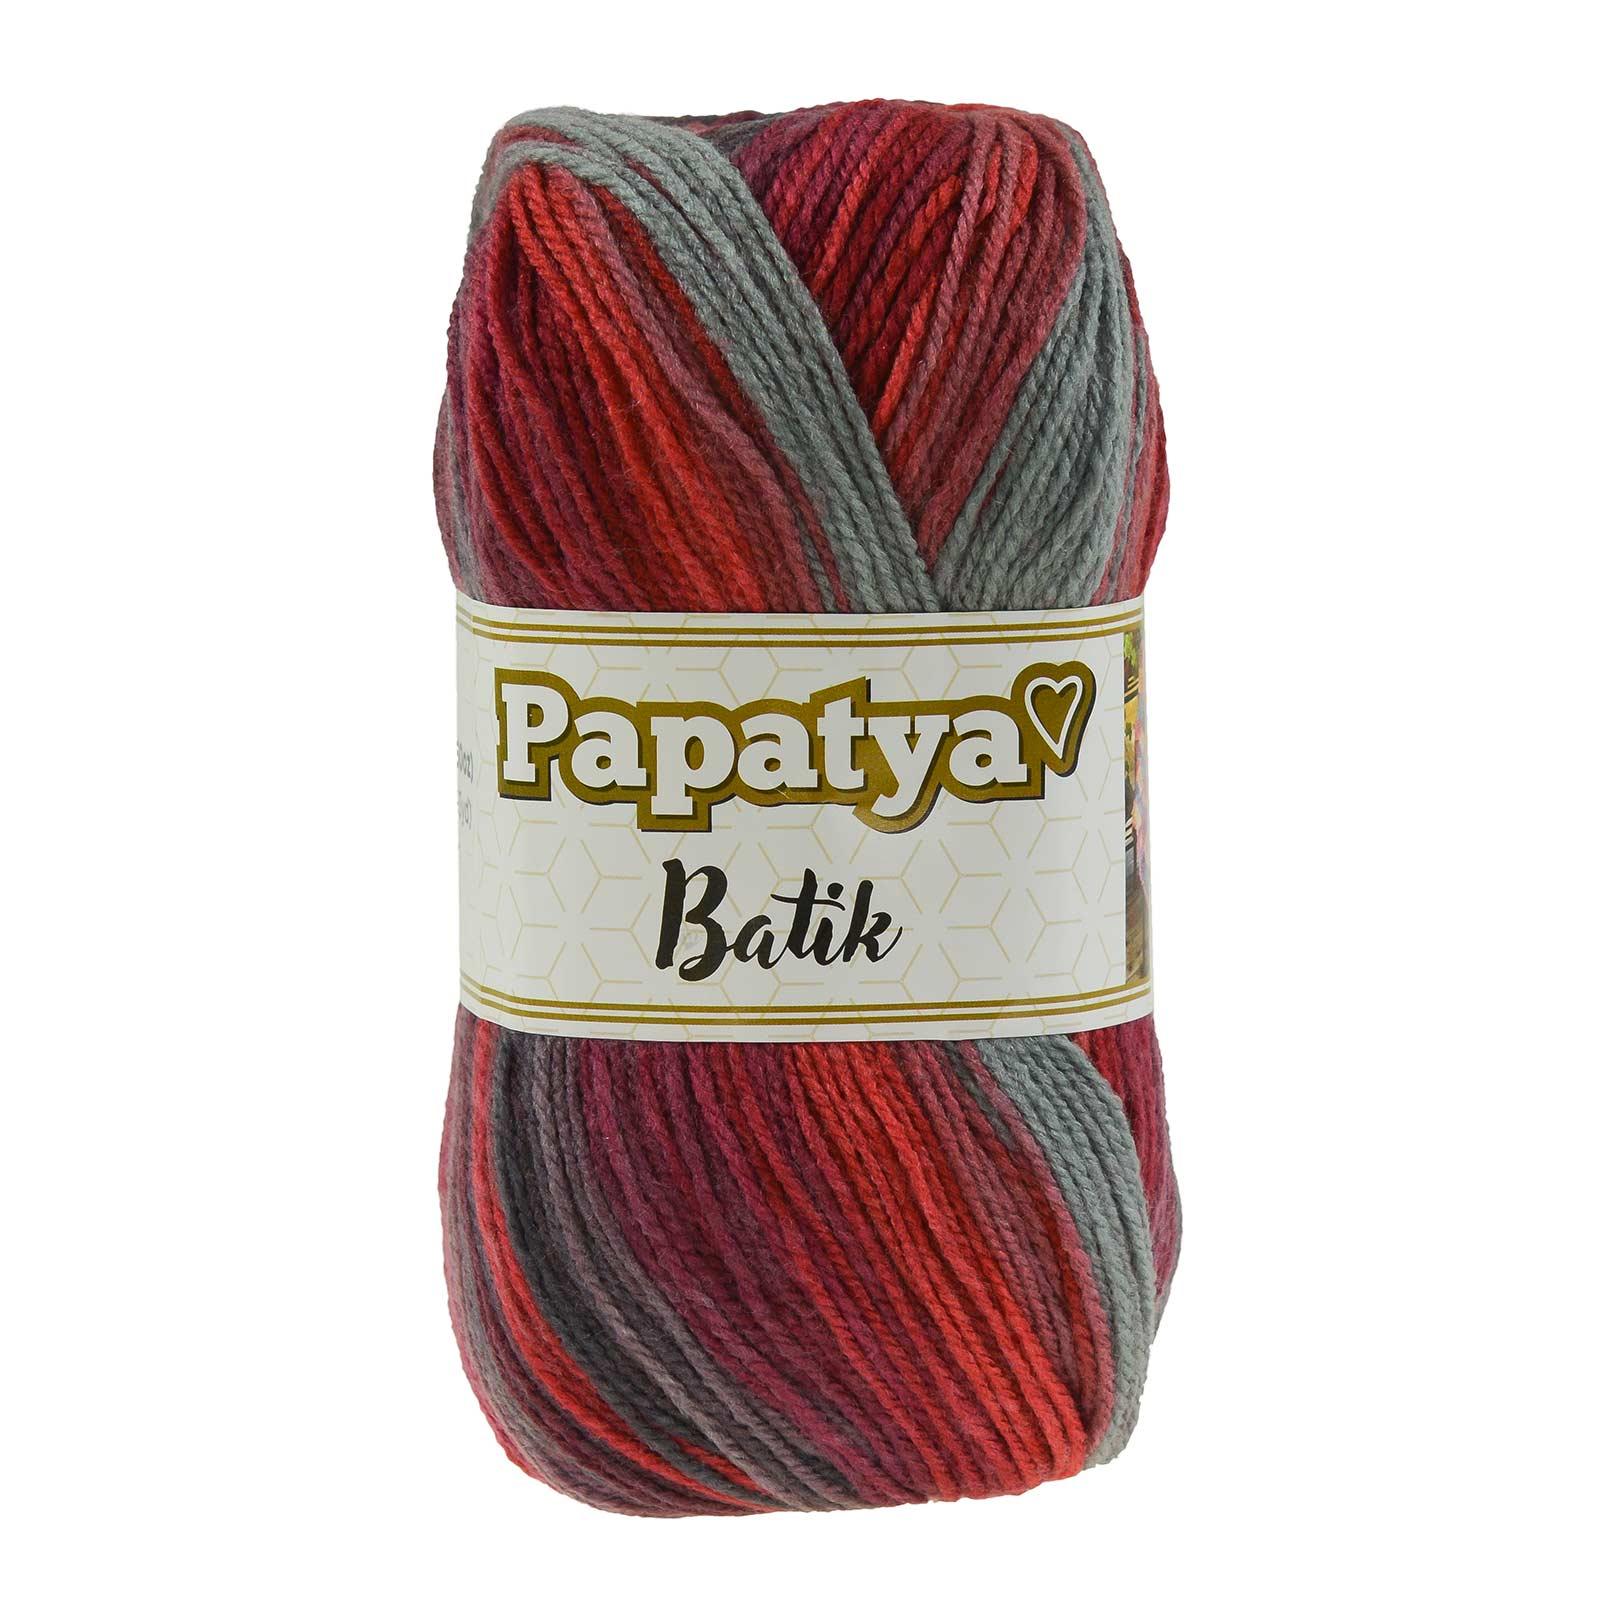 500g Farbverlaufsgarn Papatya Batik Strick-Wolle Strickgarn Häkelgarn Farbwahl – Bild 20